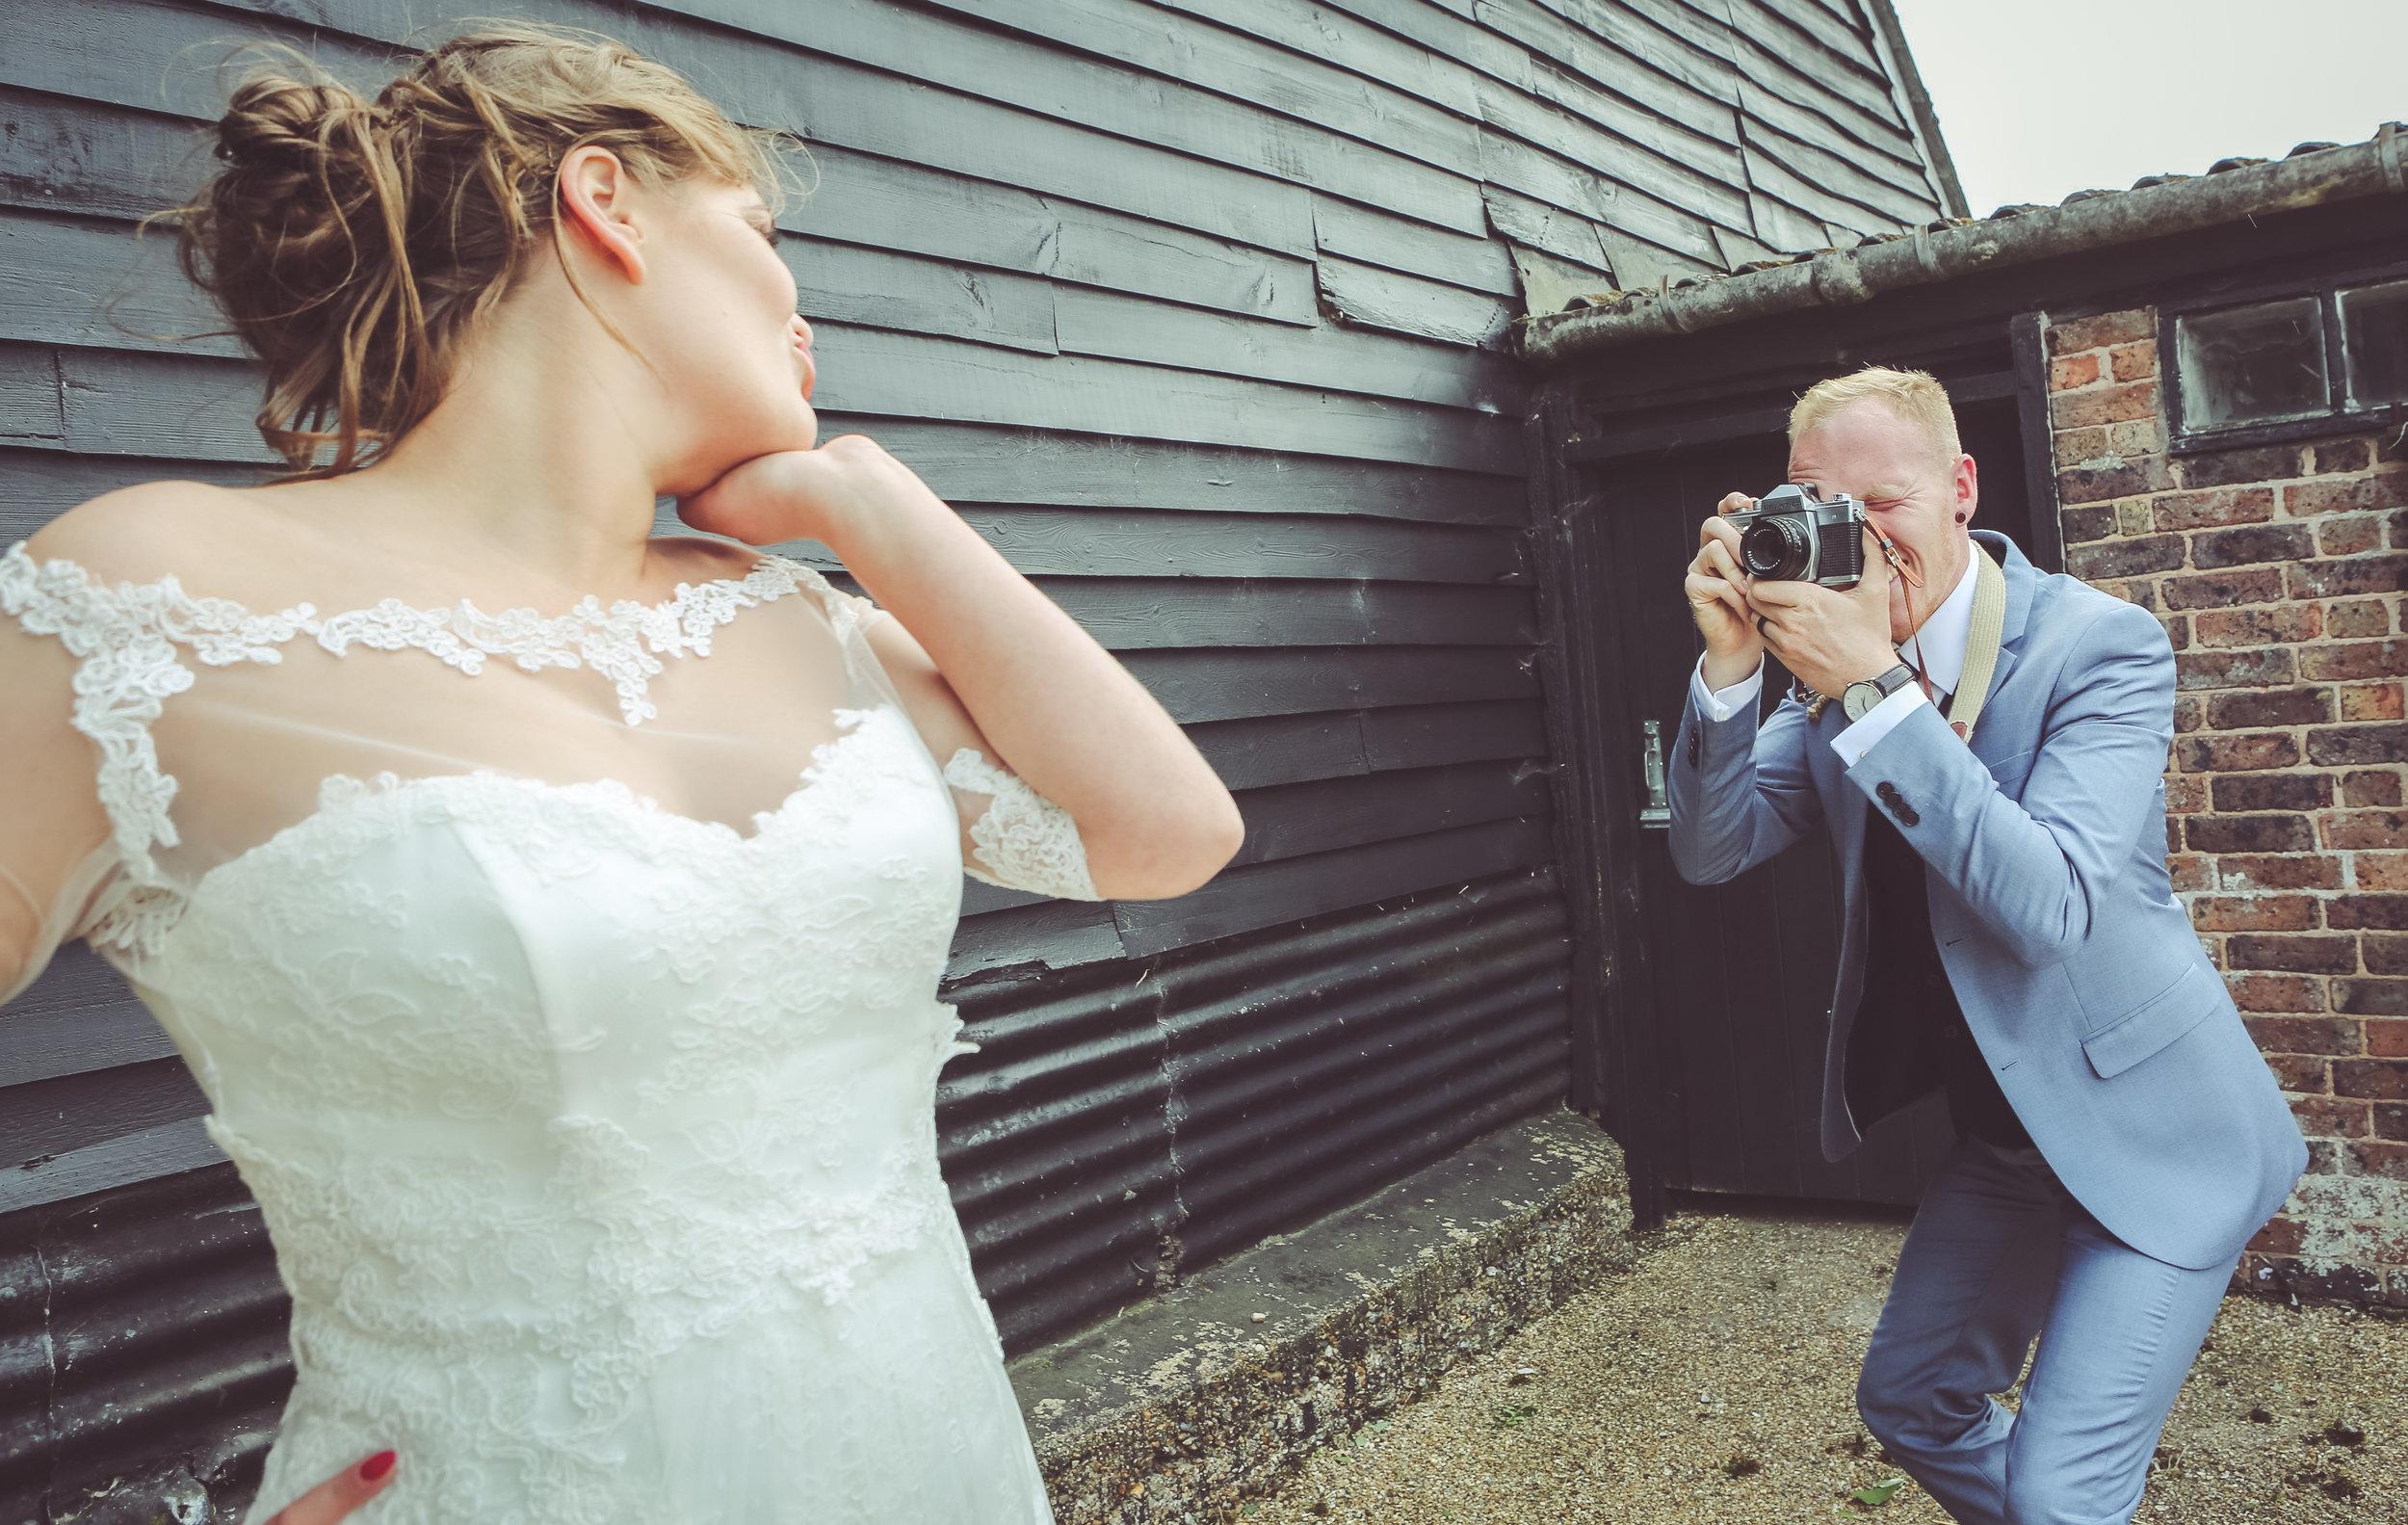 Amy & Adam Wedding - July 2nd 2016 Sussex BarnAmy & Adam Wedding - Sussex BarnFRNH2274.jpg